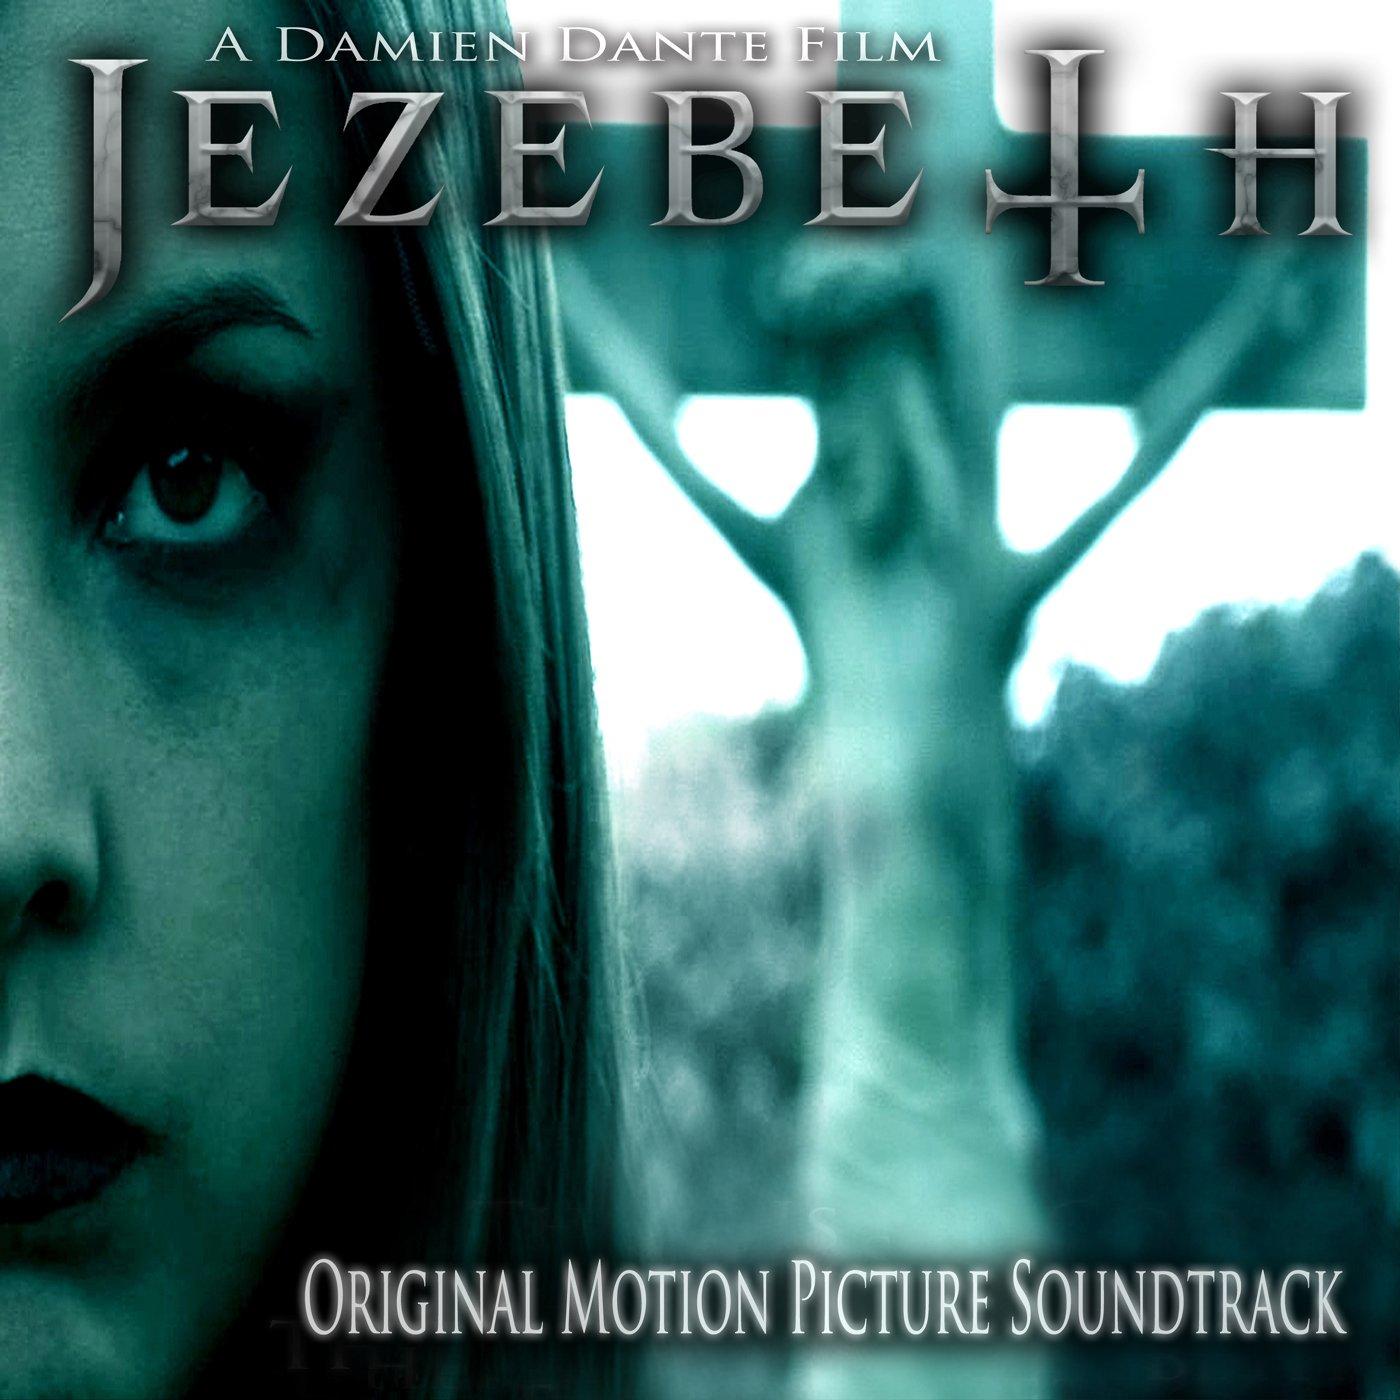 Jezebeth Motion Picture Soundtrack USB Wristband